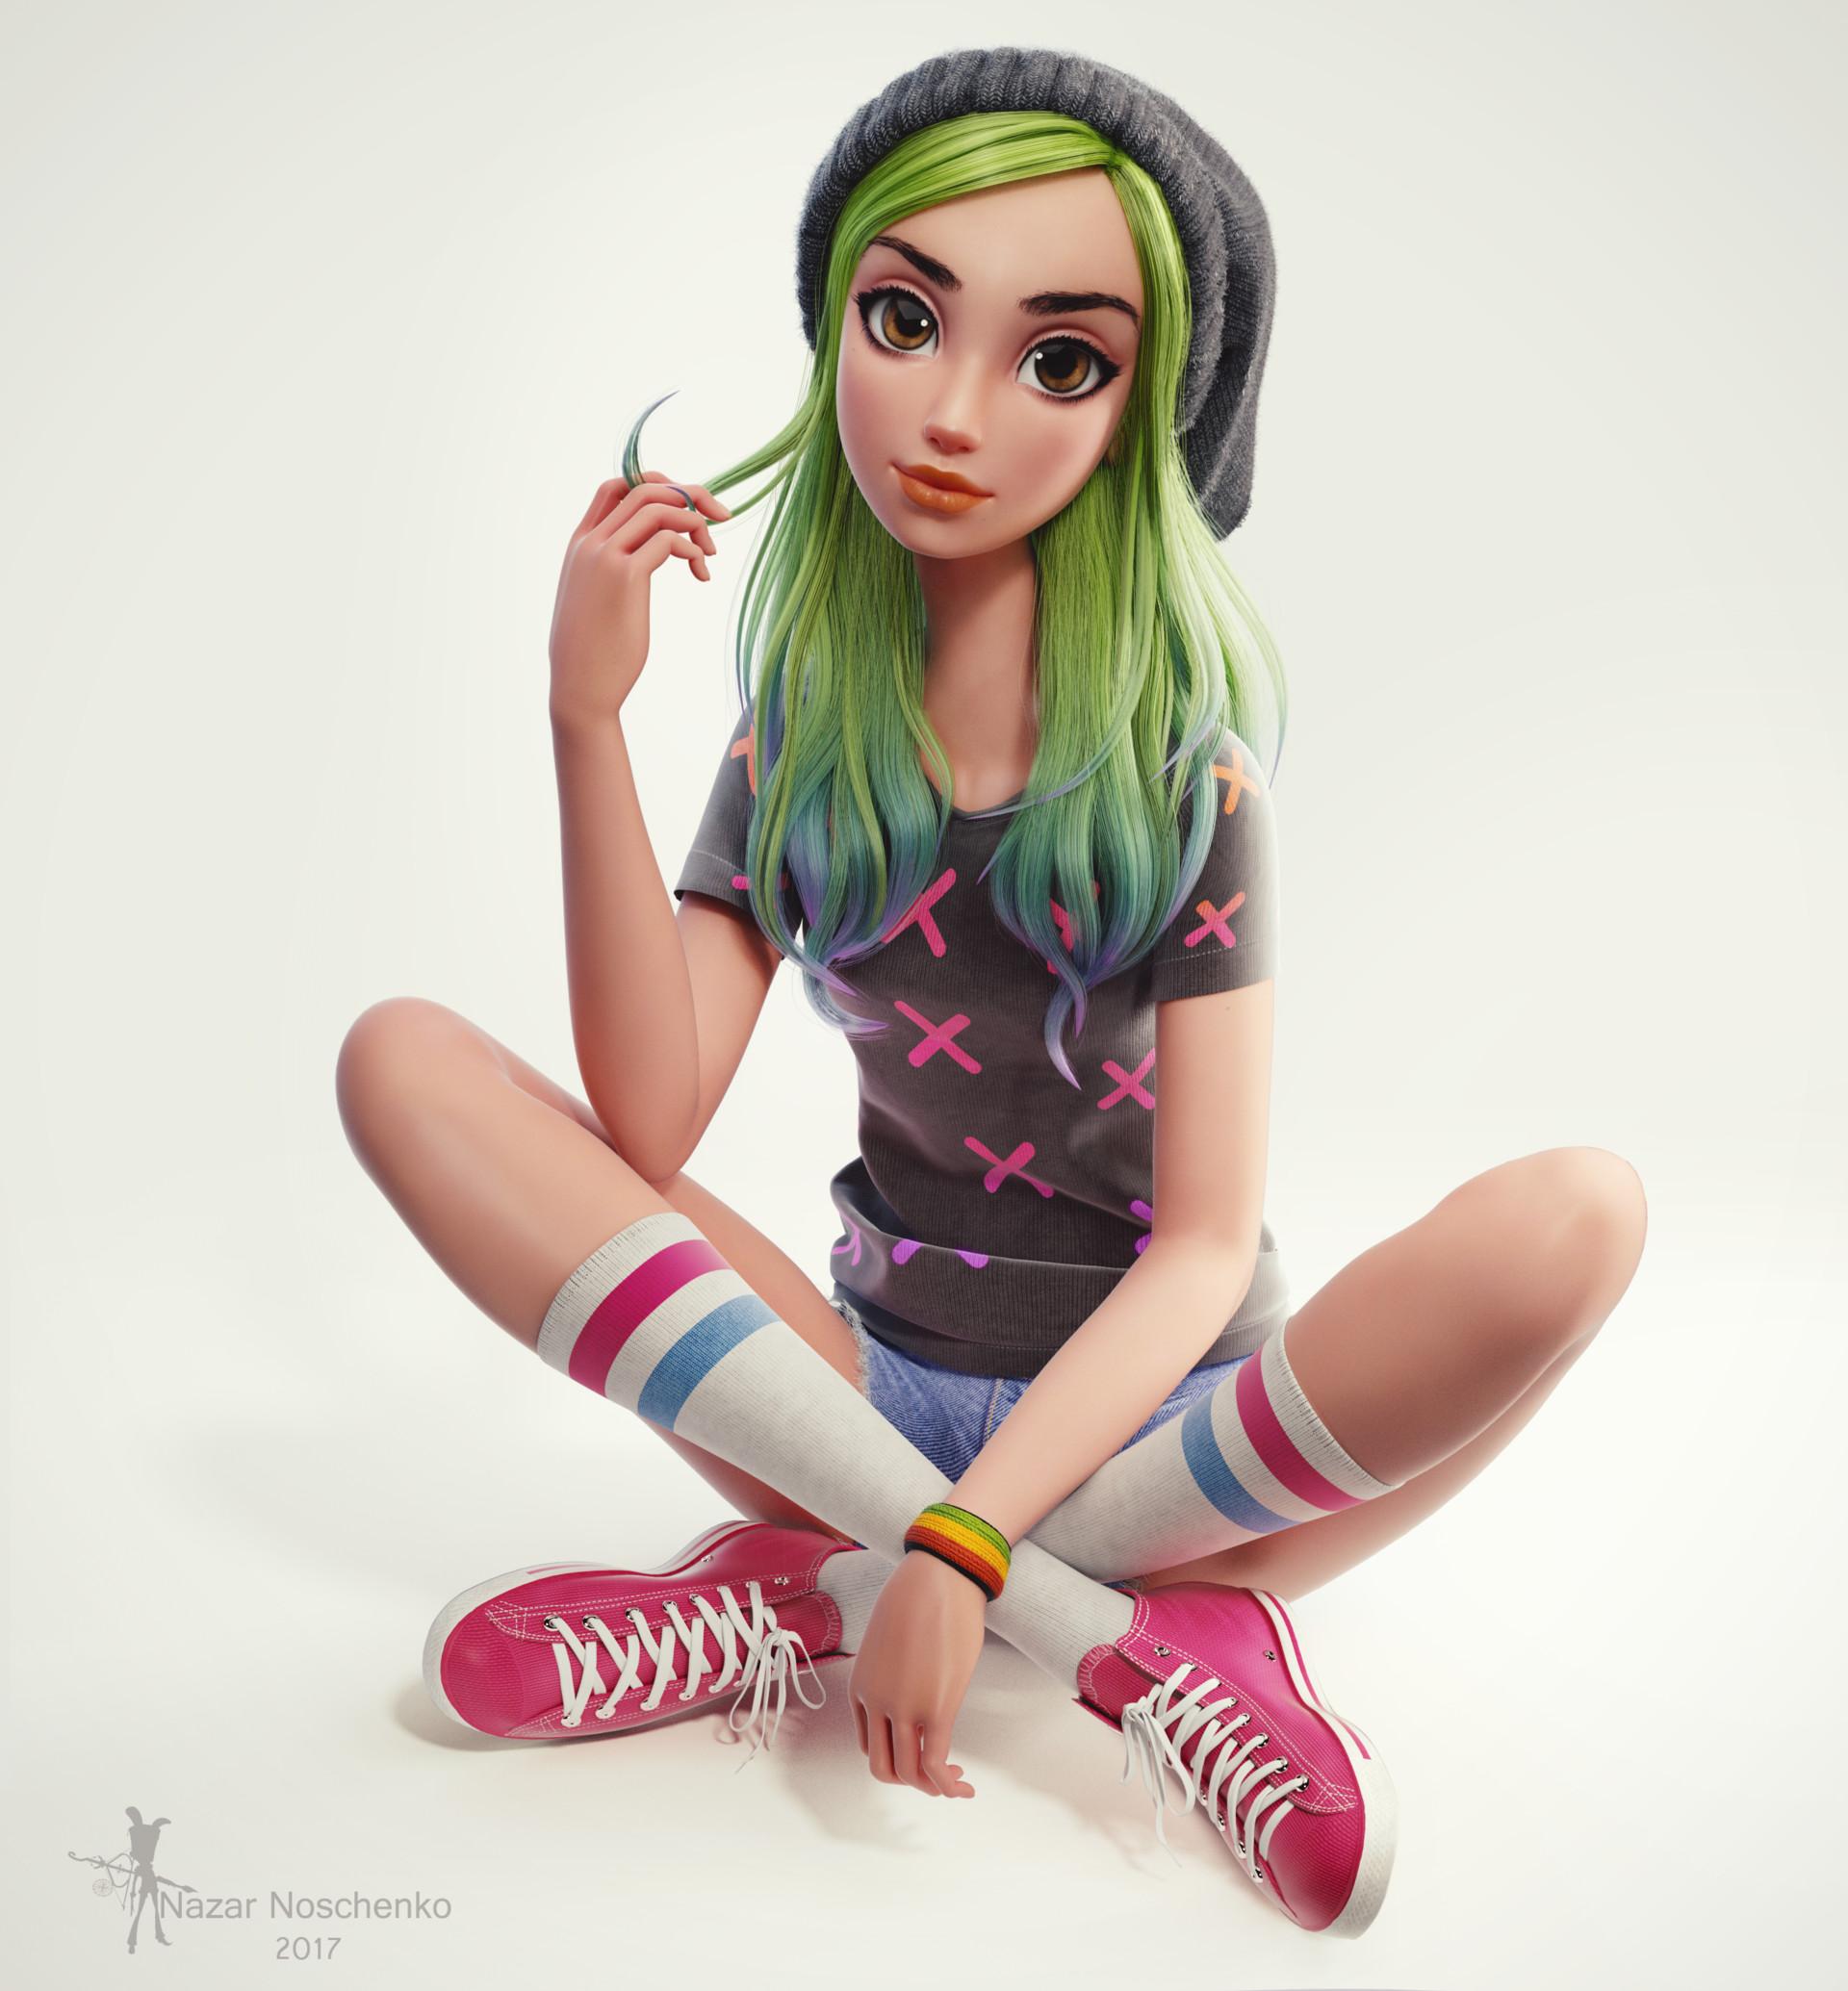 green_hair_girl.jpg